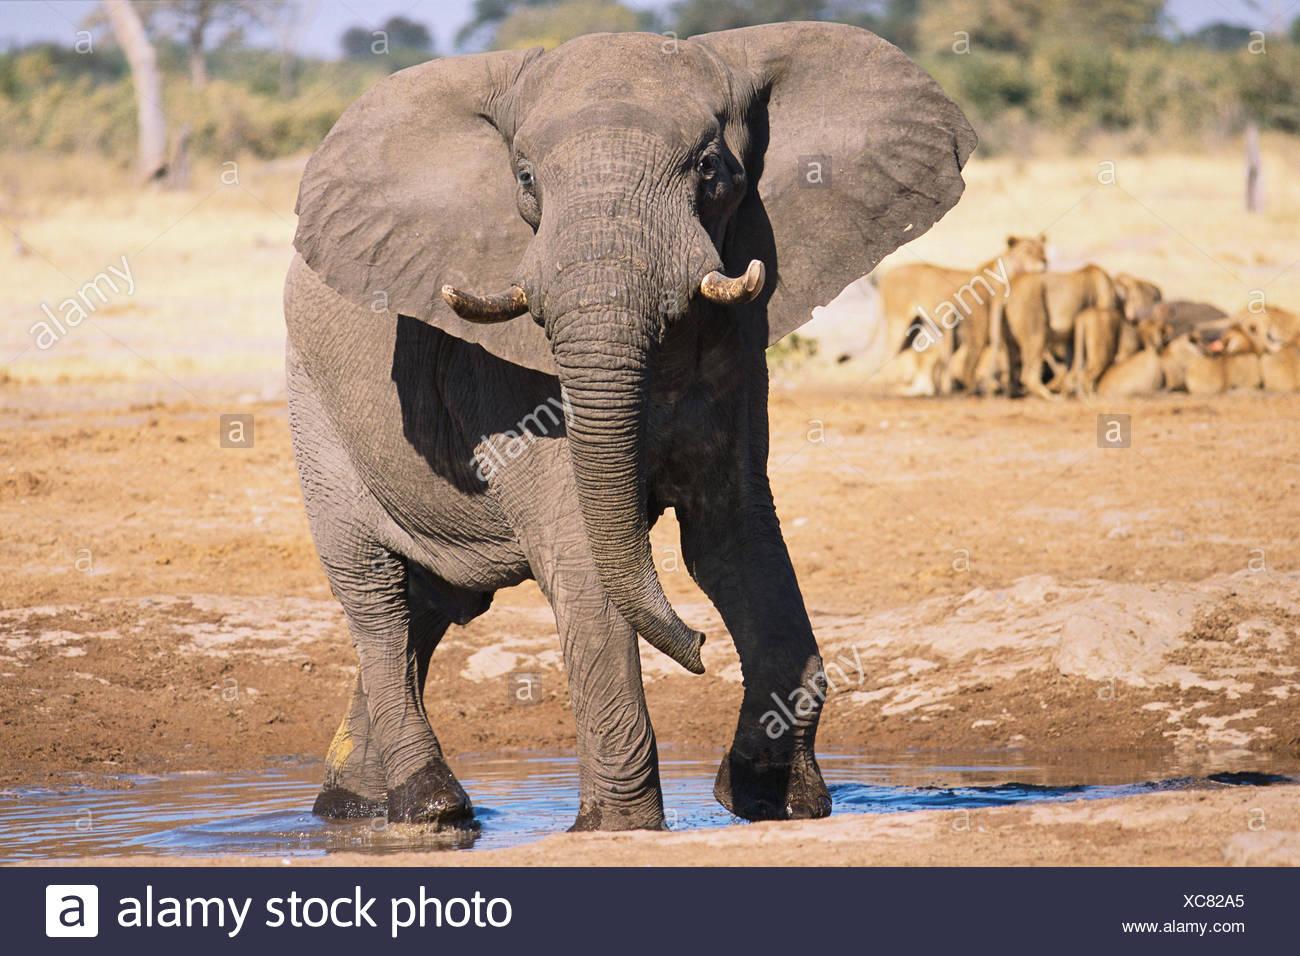 Elephant at Watering Hole - Stock Image